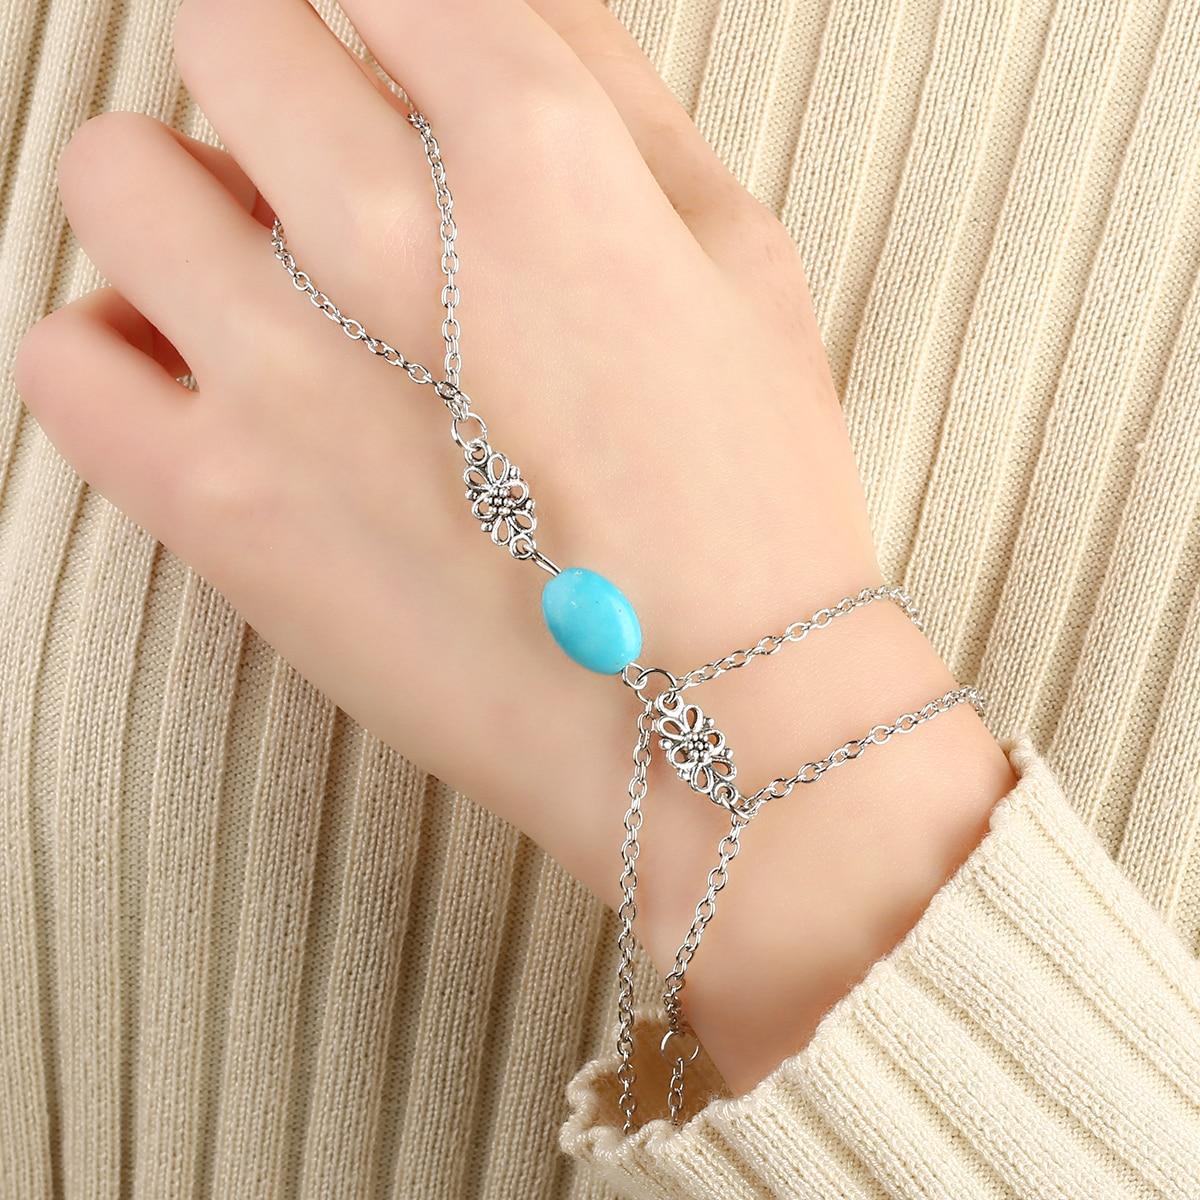 Genereus Vrouwen Boho Sieraden Vintage Charms Natuurlijke Groene Steen Slave Chain Hand Harness Armband Verzilverd Kralen Zomer Strand Decor